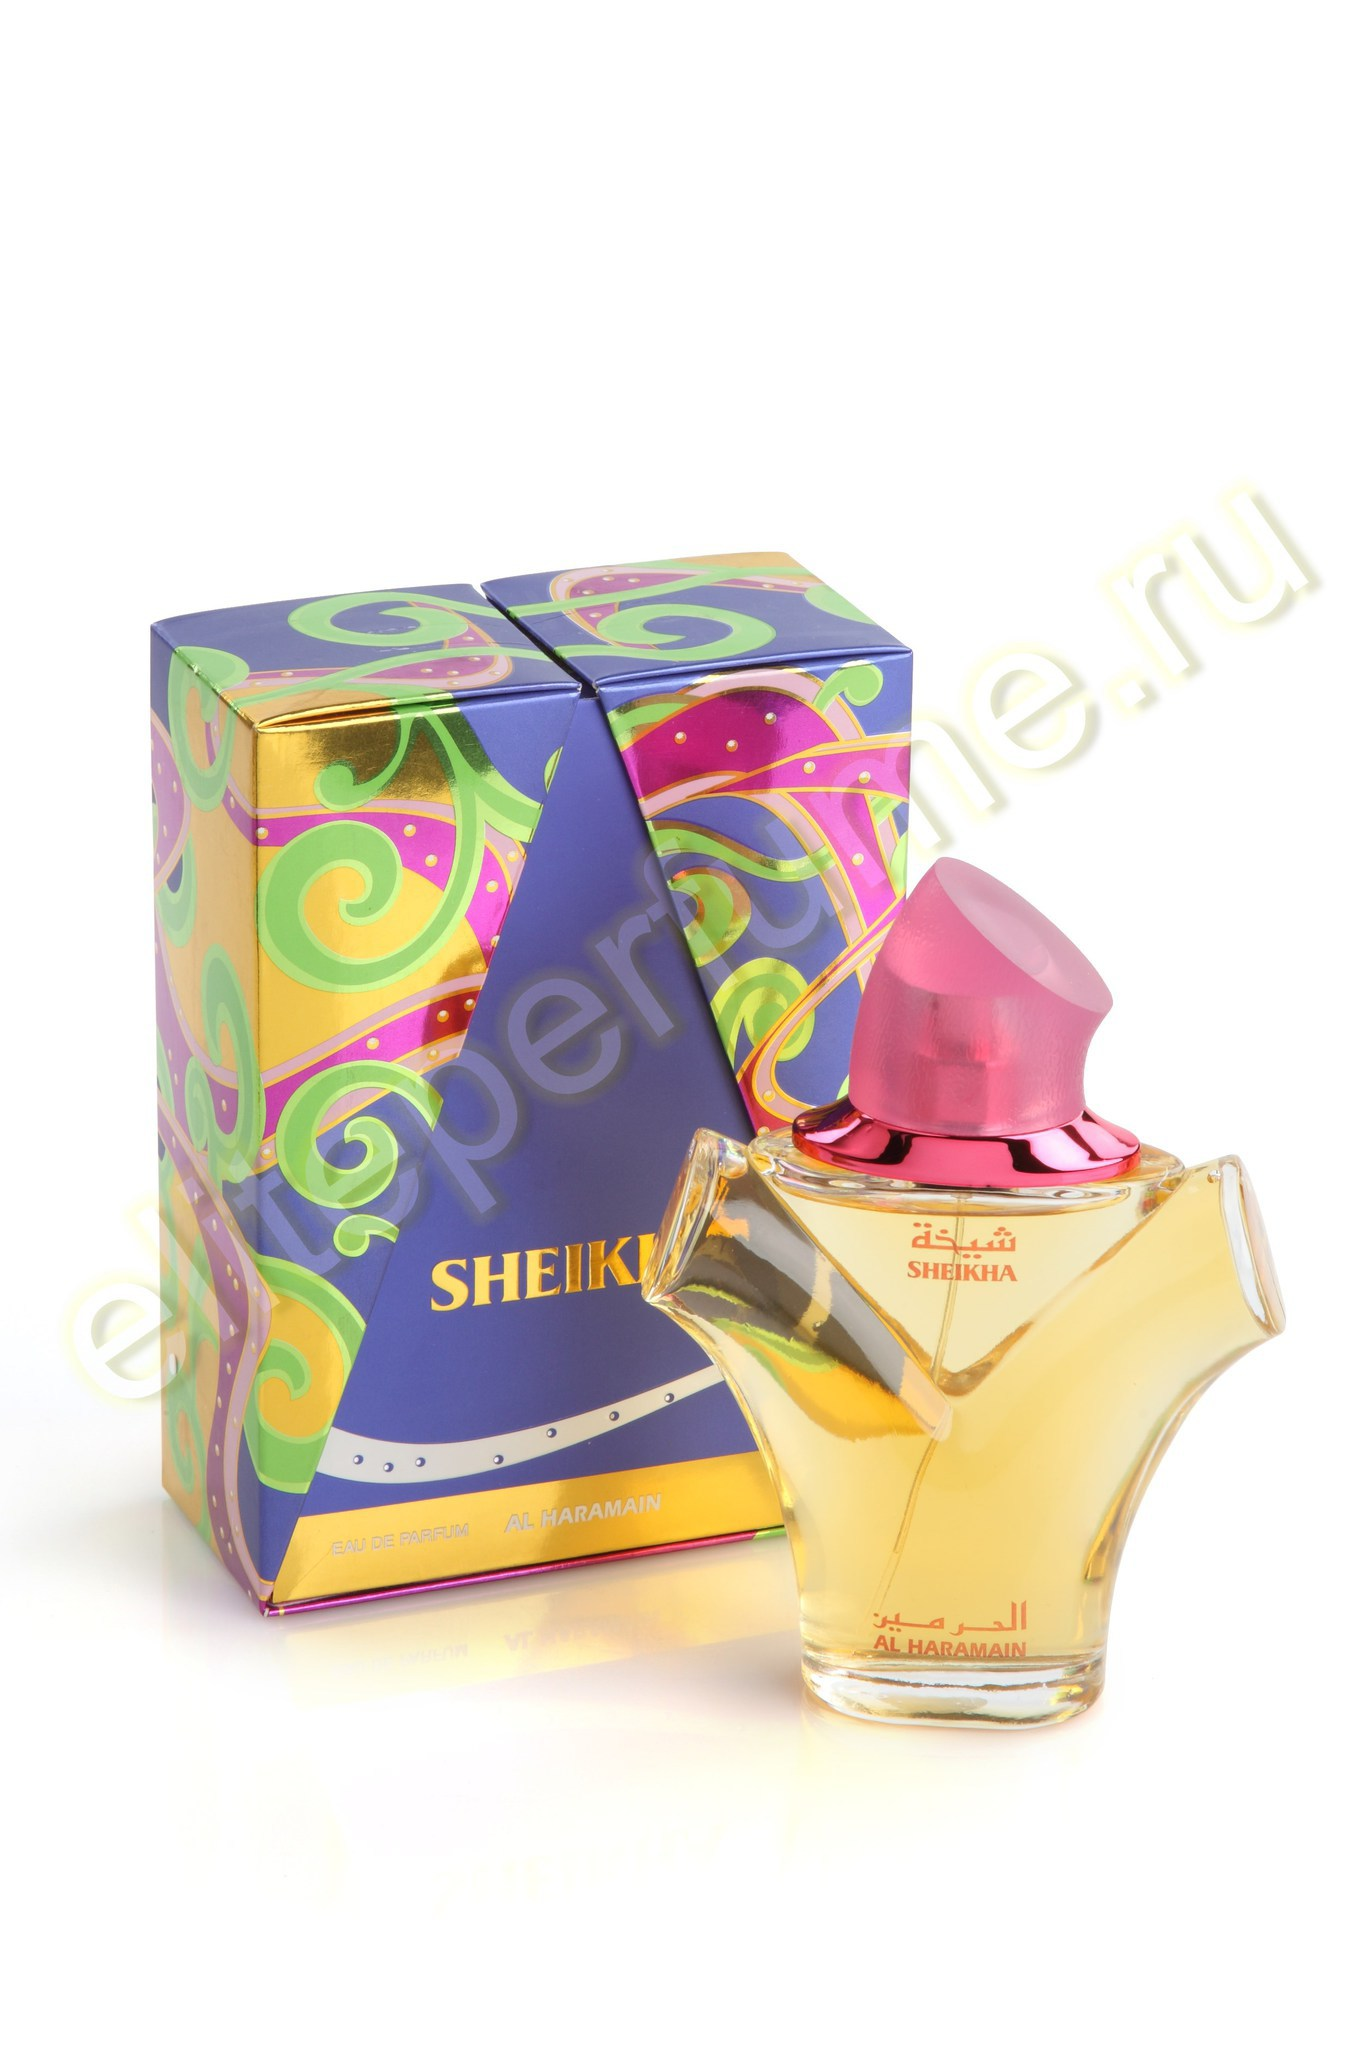 Пробники для духов Sheikha Шейха 1 мл спрей от Аль Харамайн Al Haramain Perfumes